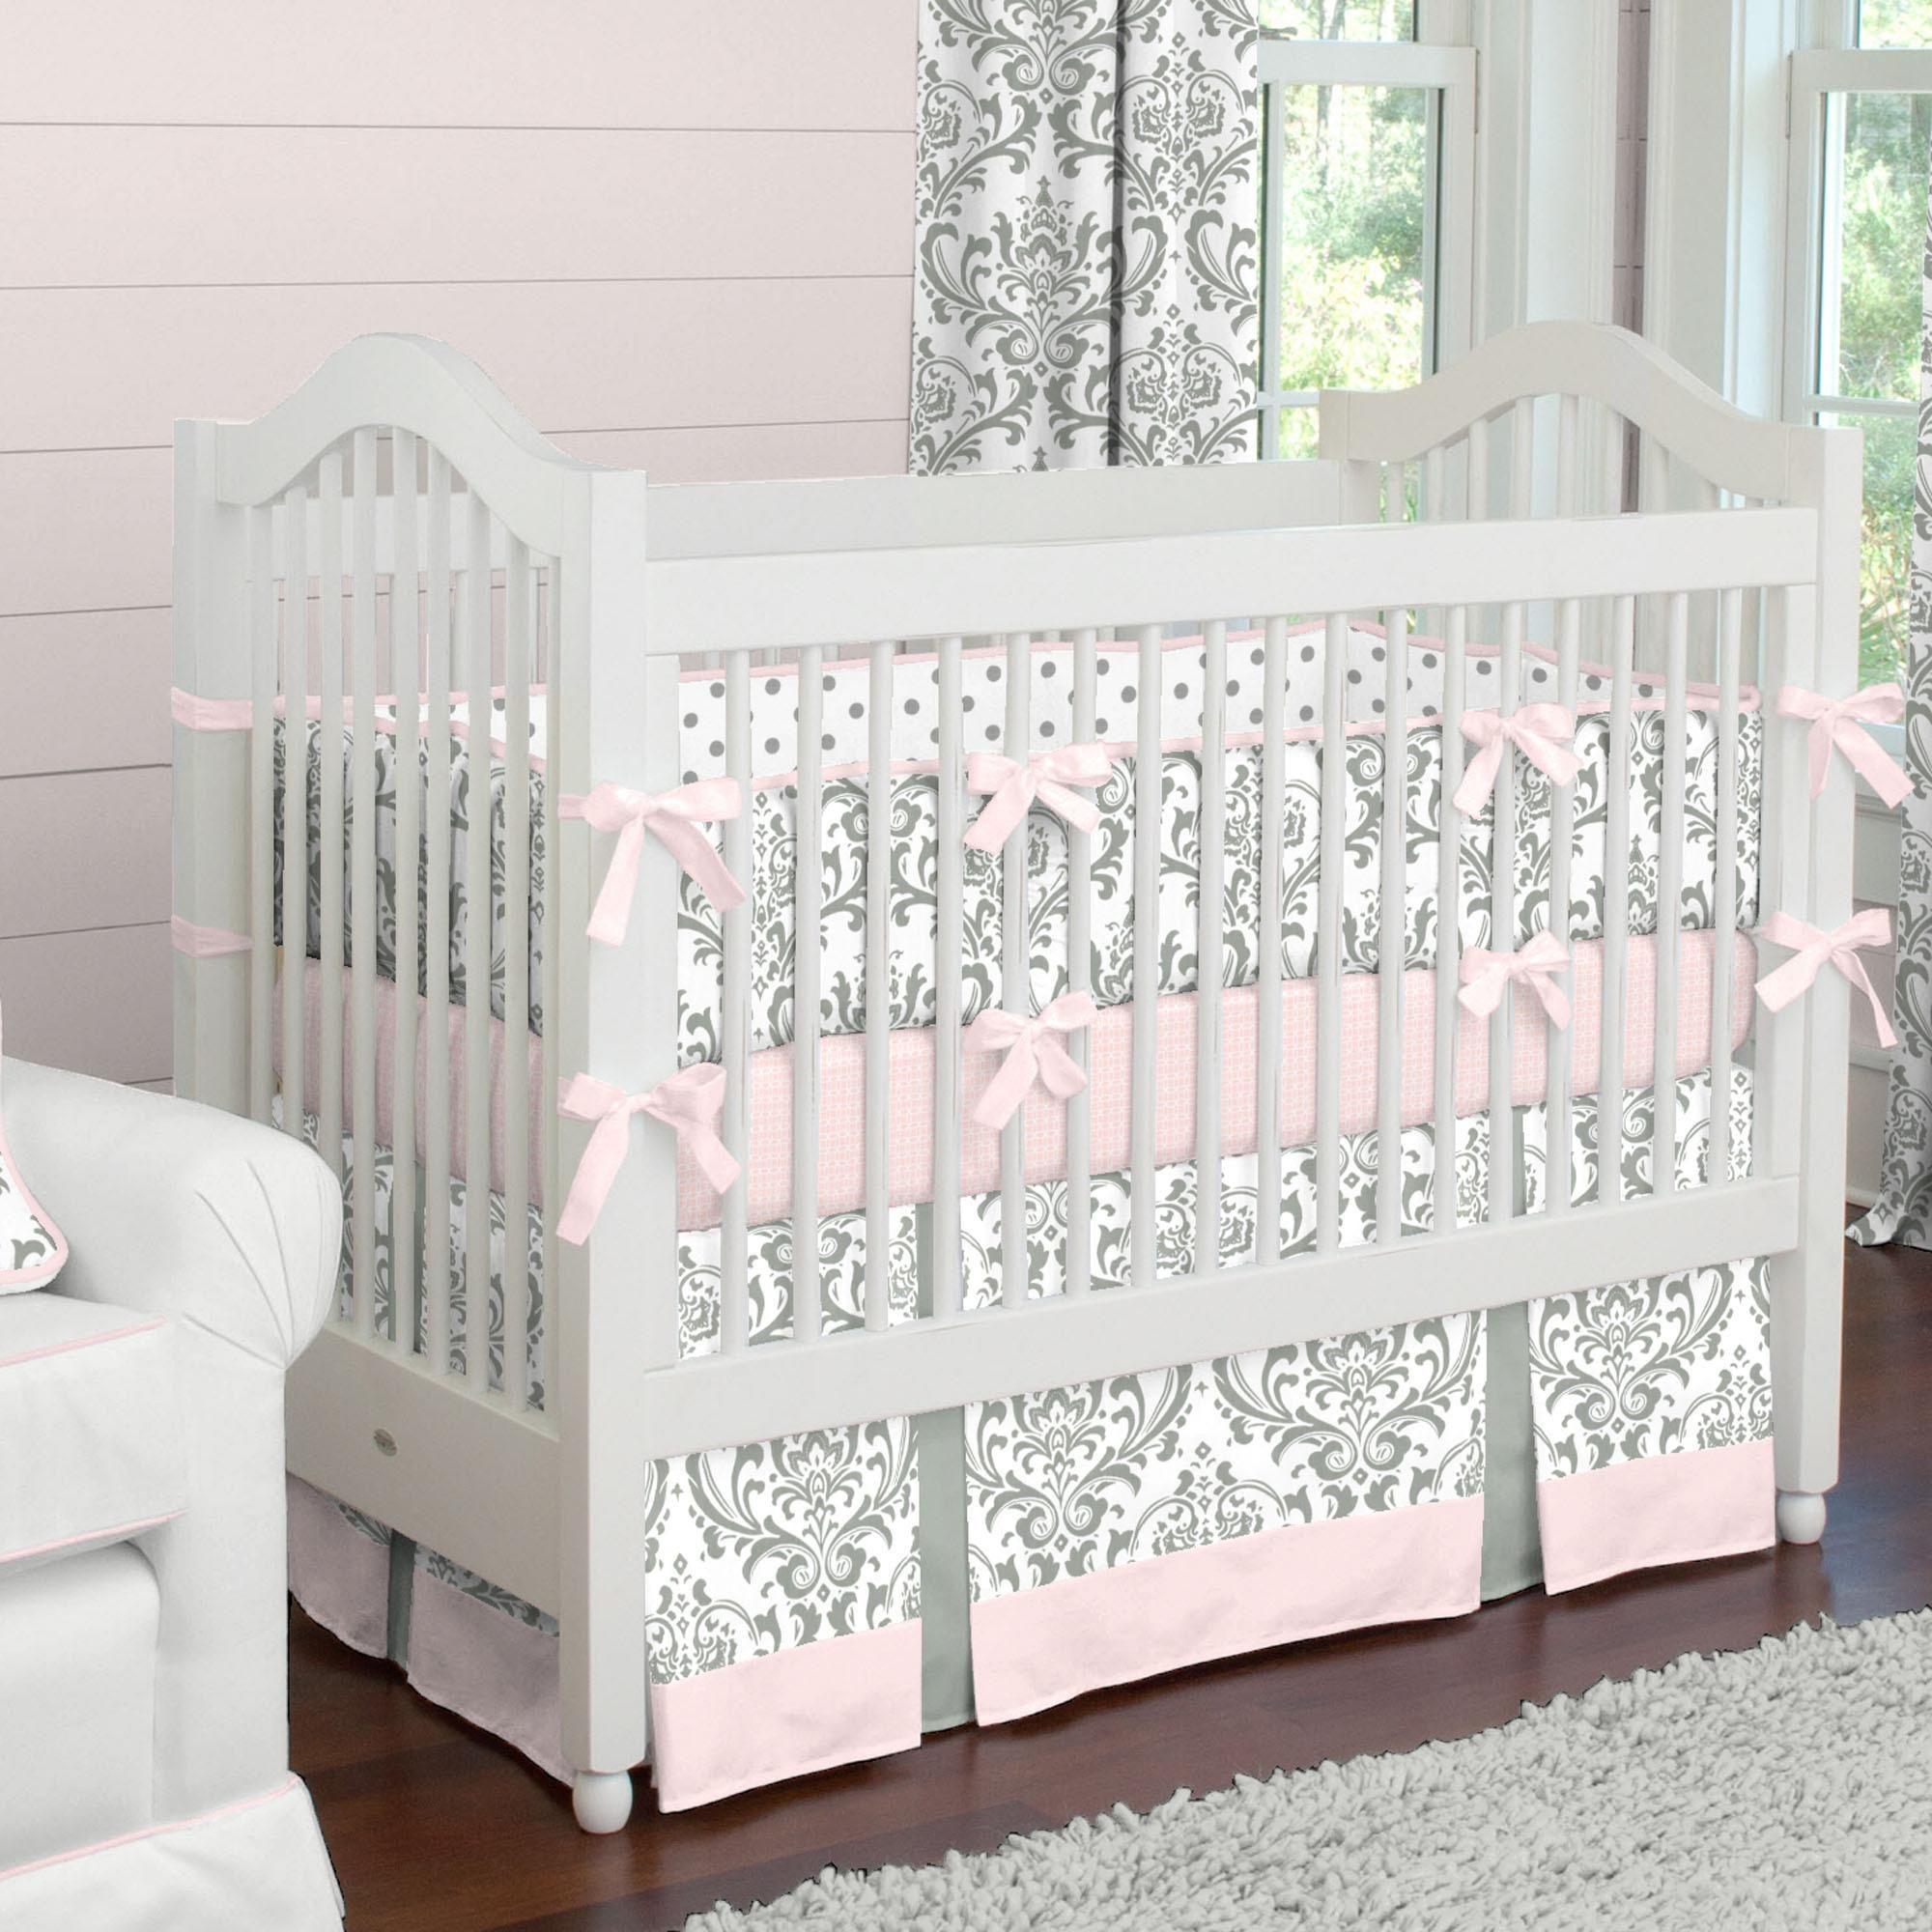 Pink And Gray Traditions Baby Crib Bedding Girl Crib Bedding